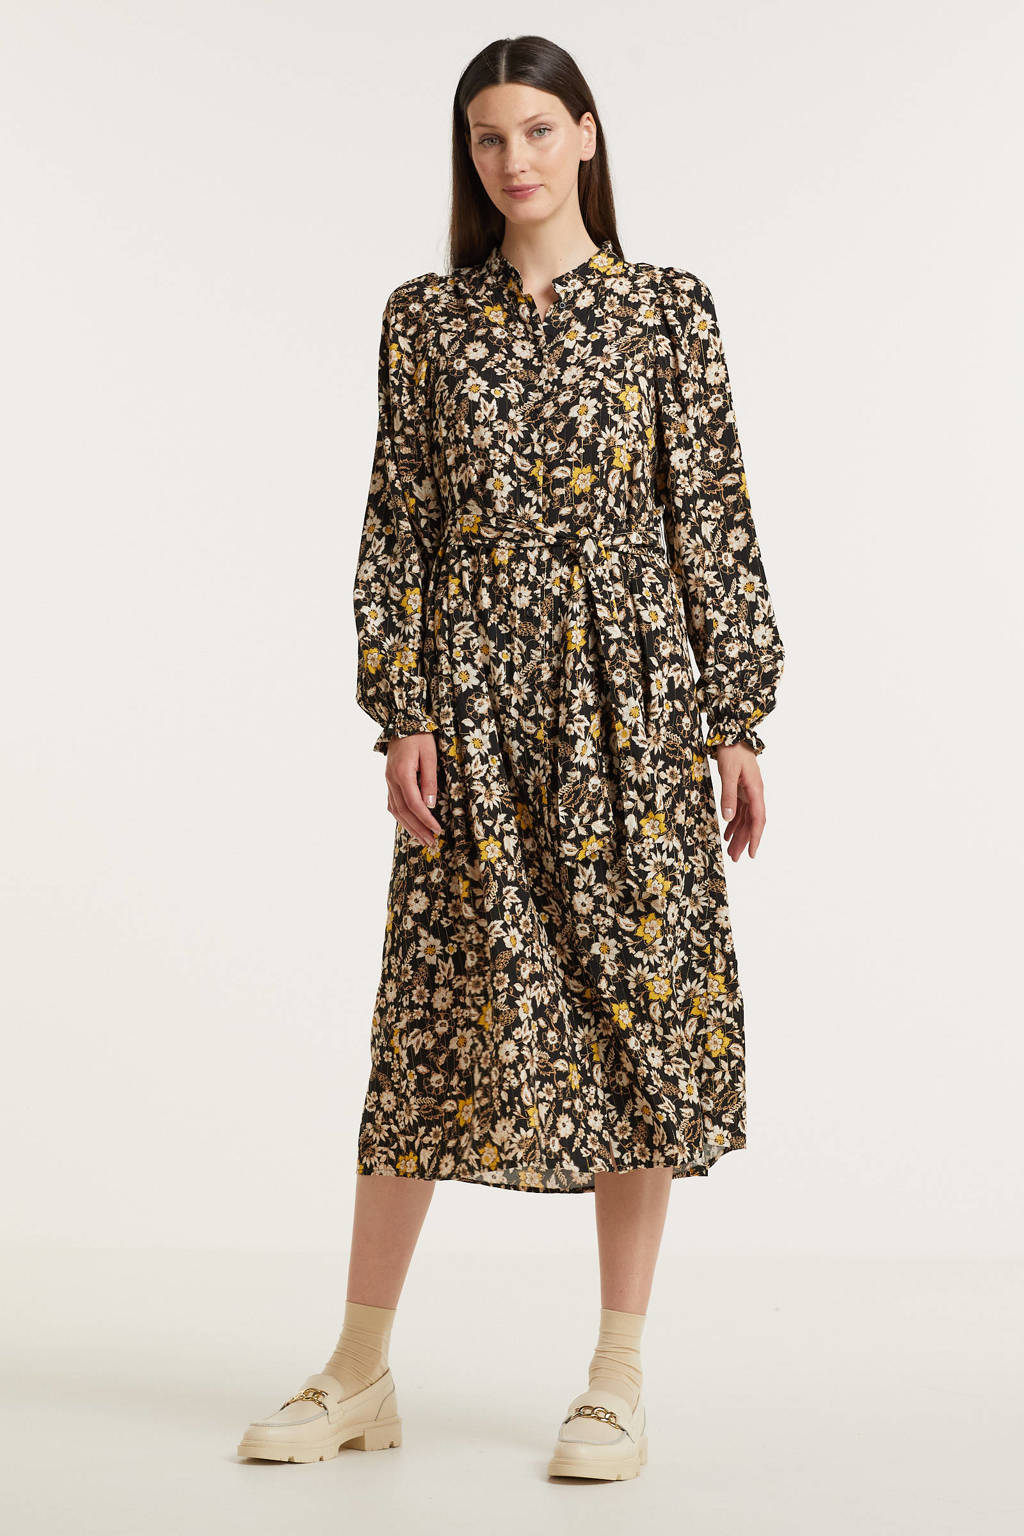 B.Young blousejurk BYFIONNA met all over print en ceintuur zwart/ecru/geel, Zwart/ecru/geel